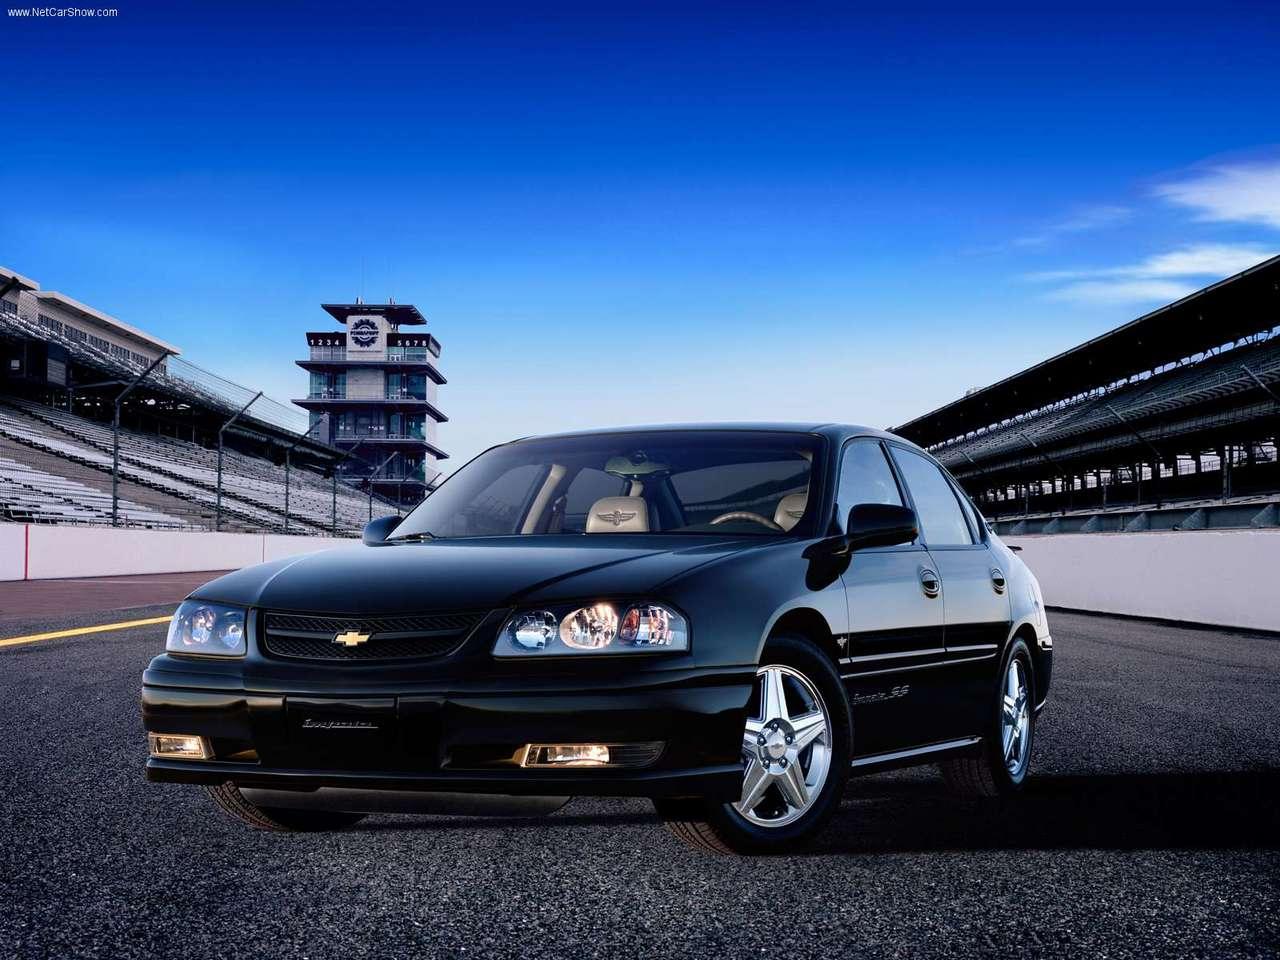 http://2.bp.blogspot.com/-OUWXvibEwDk/TX-qzjrSBYI/AAAAAAAANpA/EtmHFbq7HpU/s1600/Chevrolet-Impala_SS_2004_1280x960_wallpaper_01.jpg